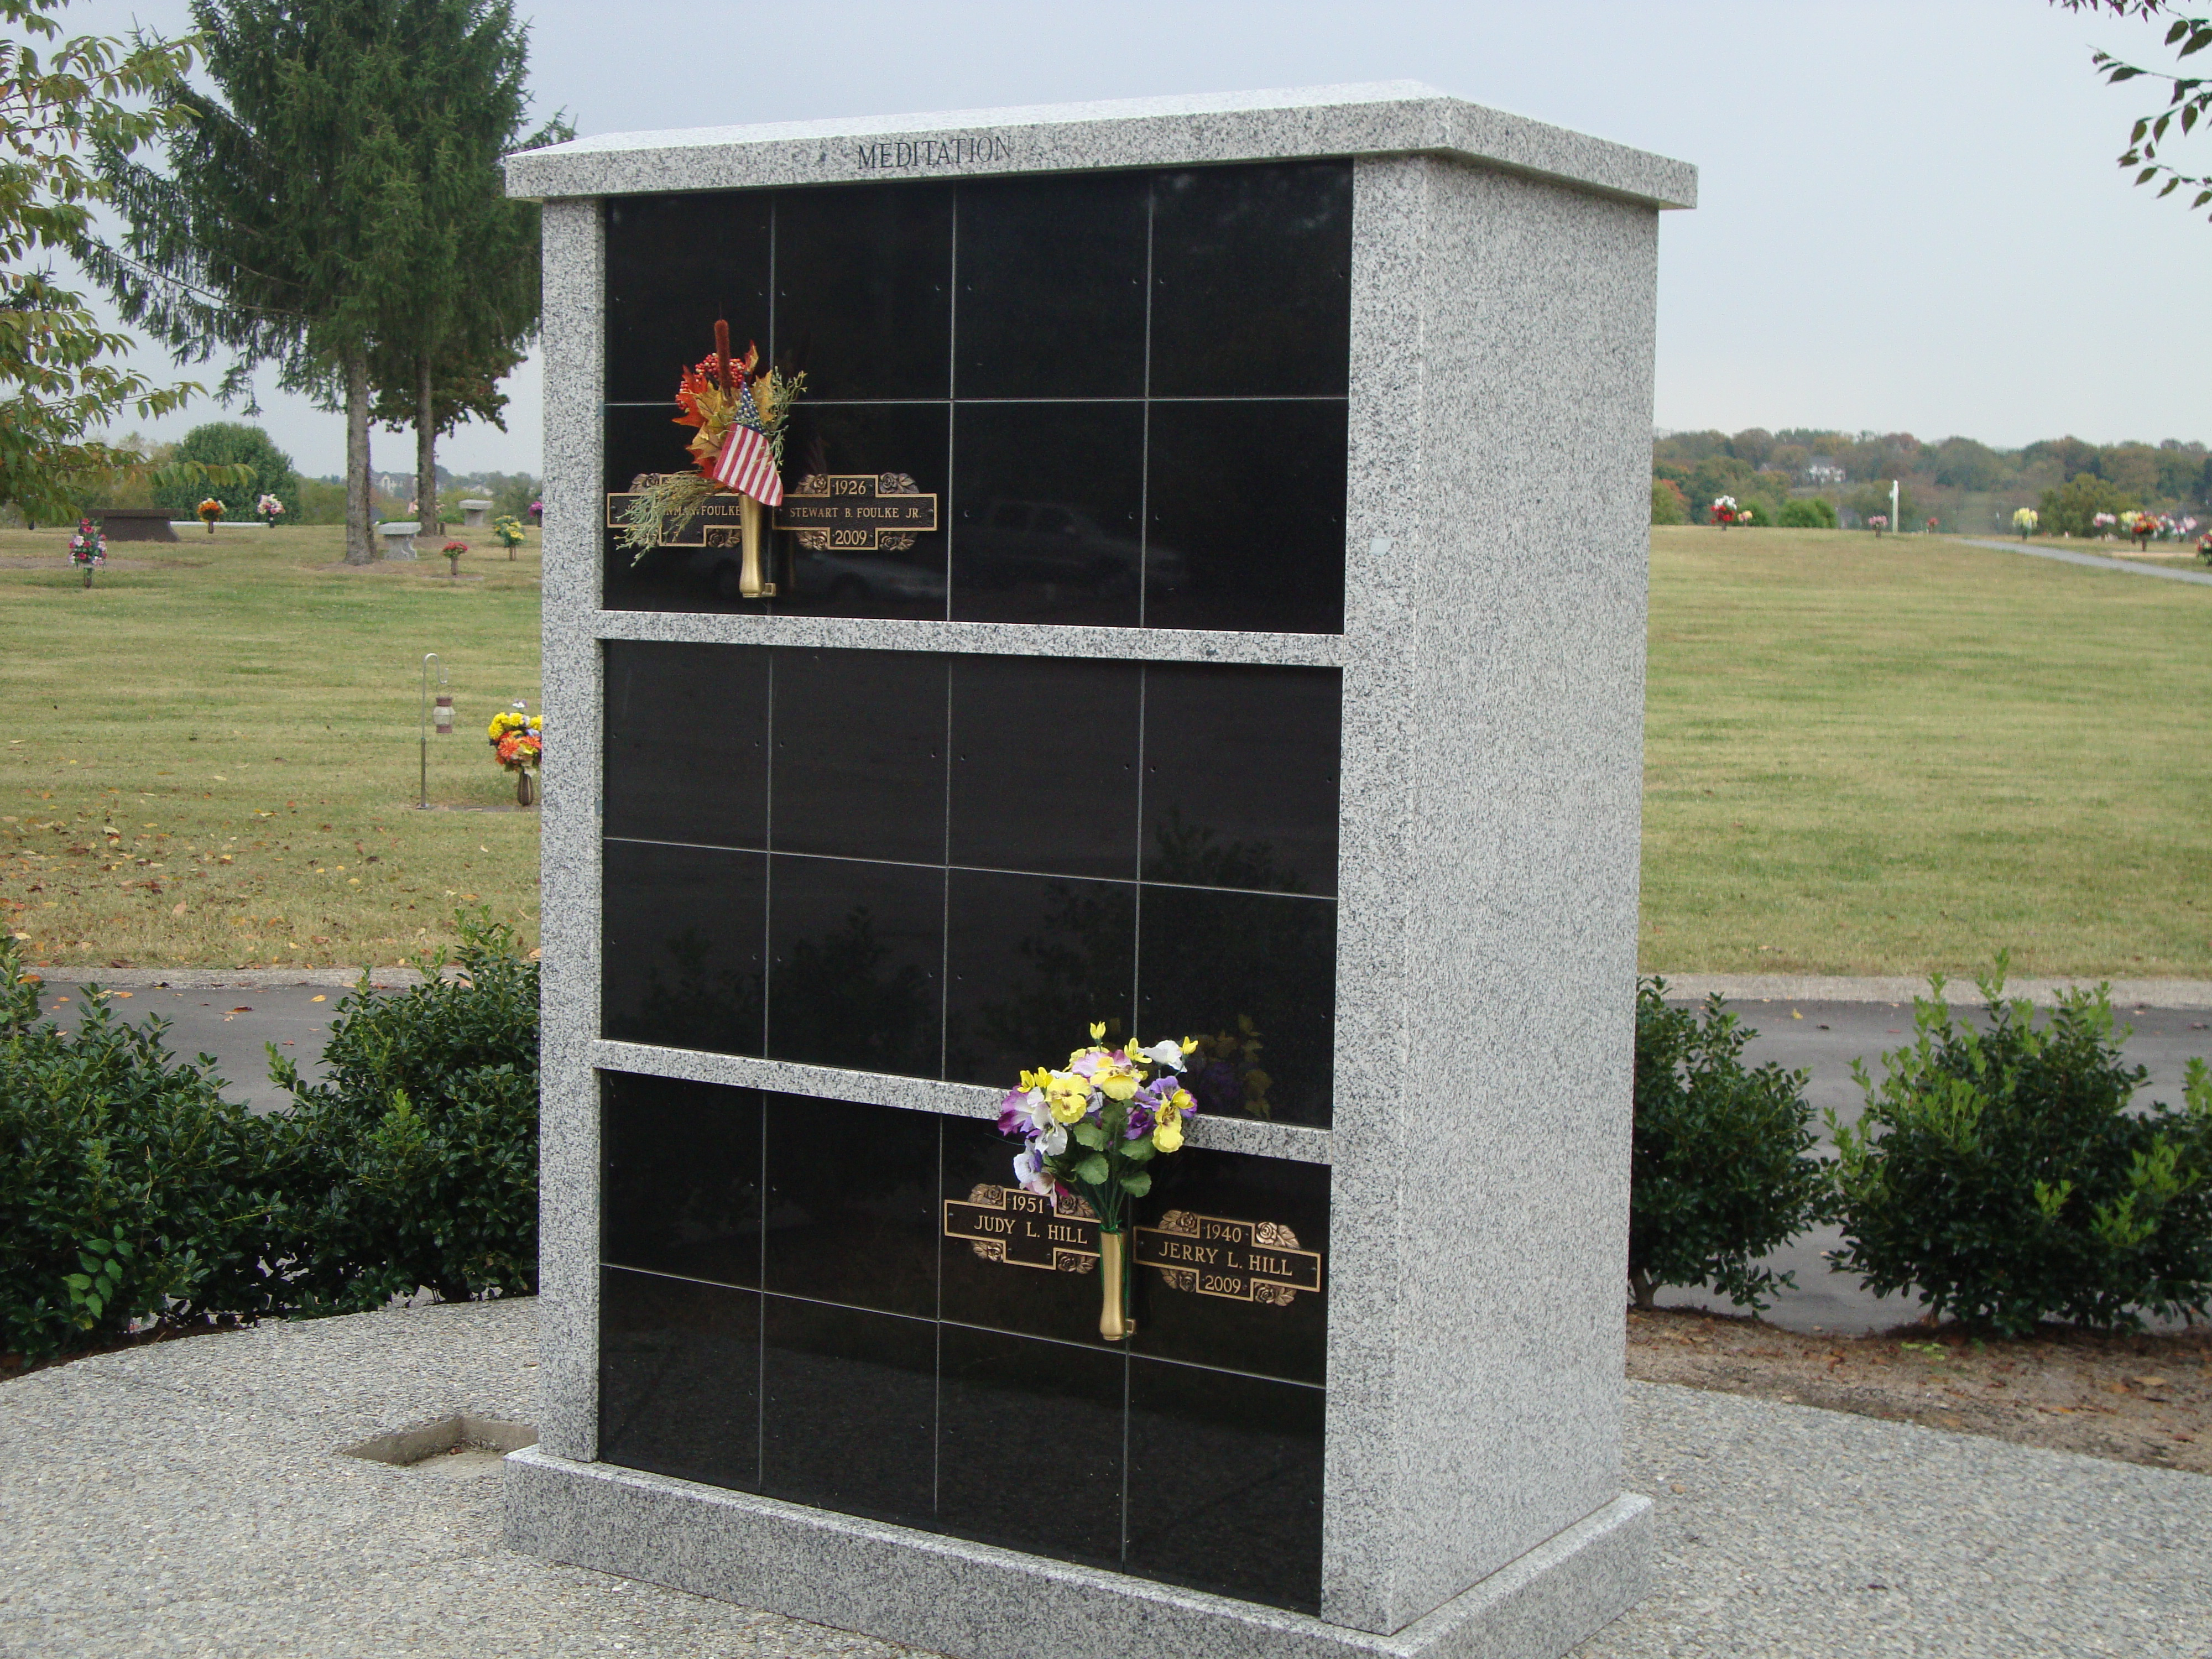 Tower Colubarium in the Cremation Gardens